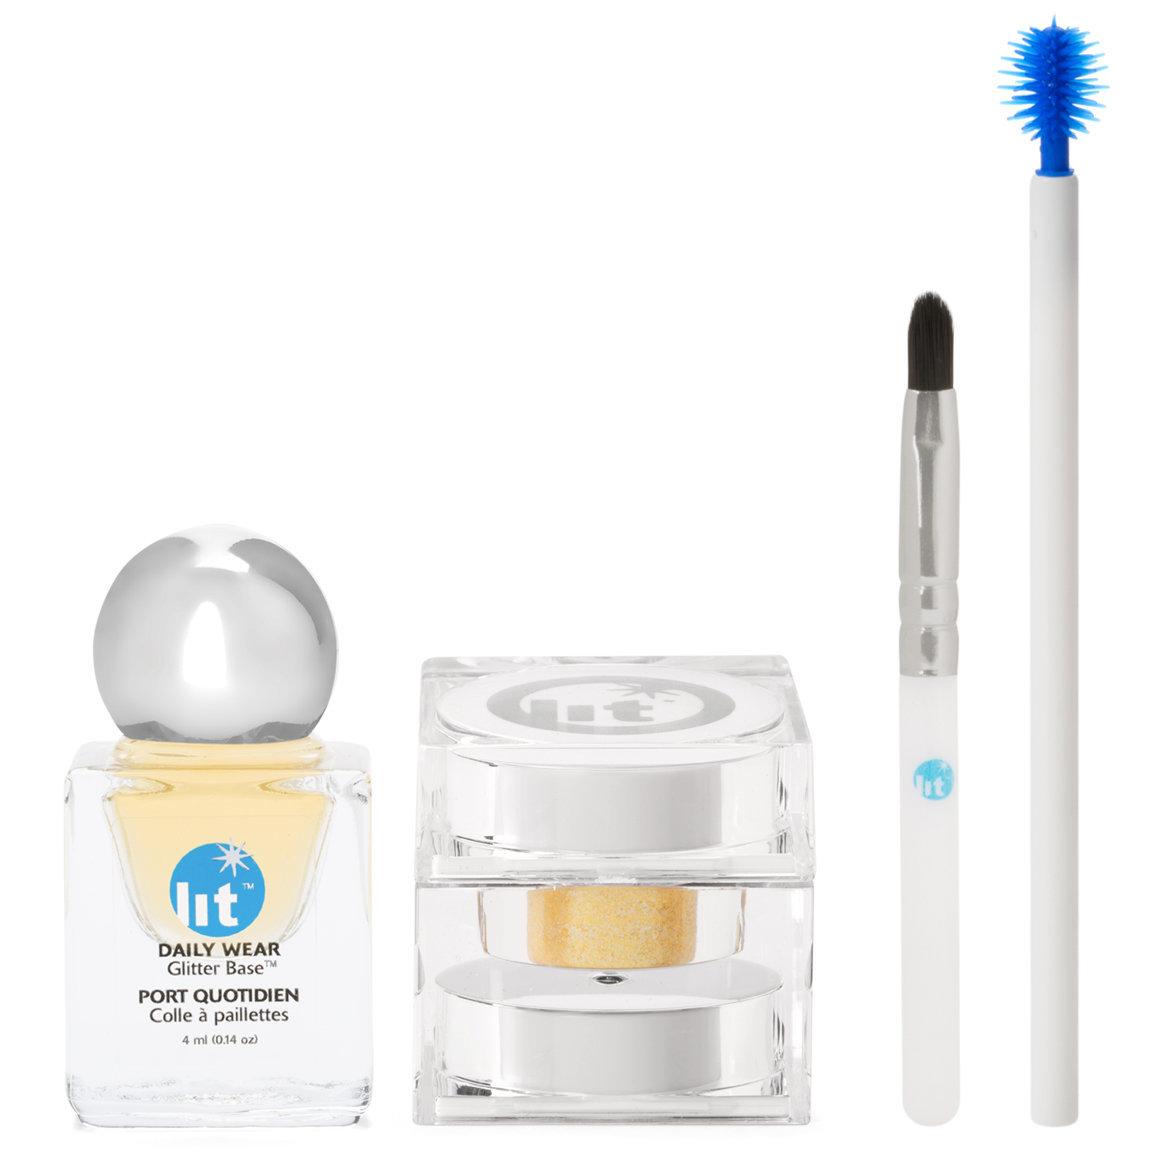 Lit Cosmetics Lit Kit: Lit Metal Kits Glisten (Silver) alternative view 1.